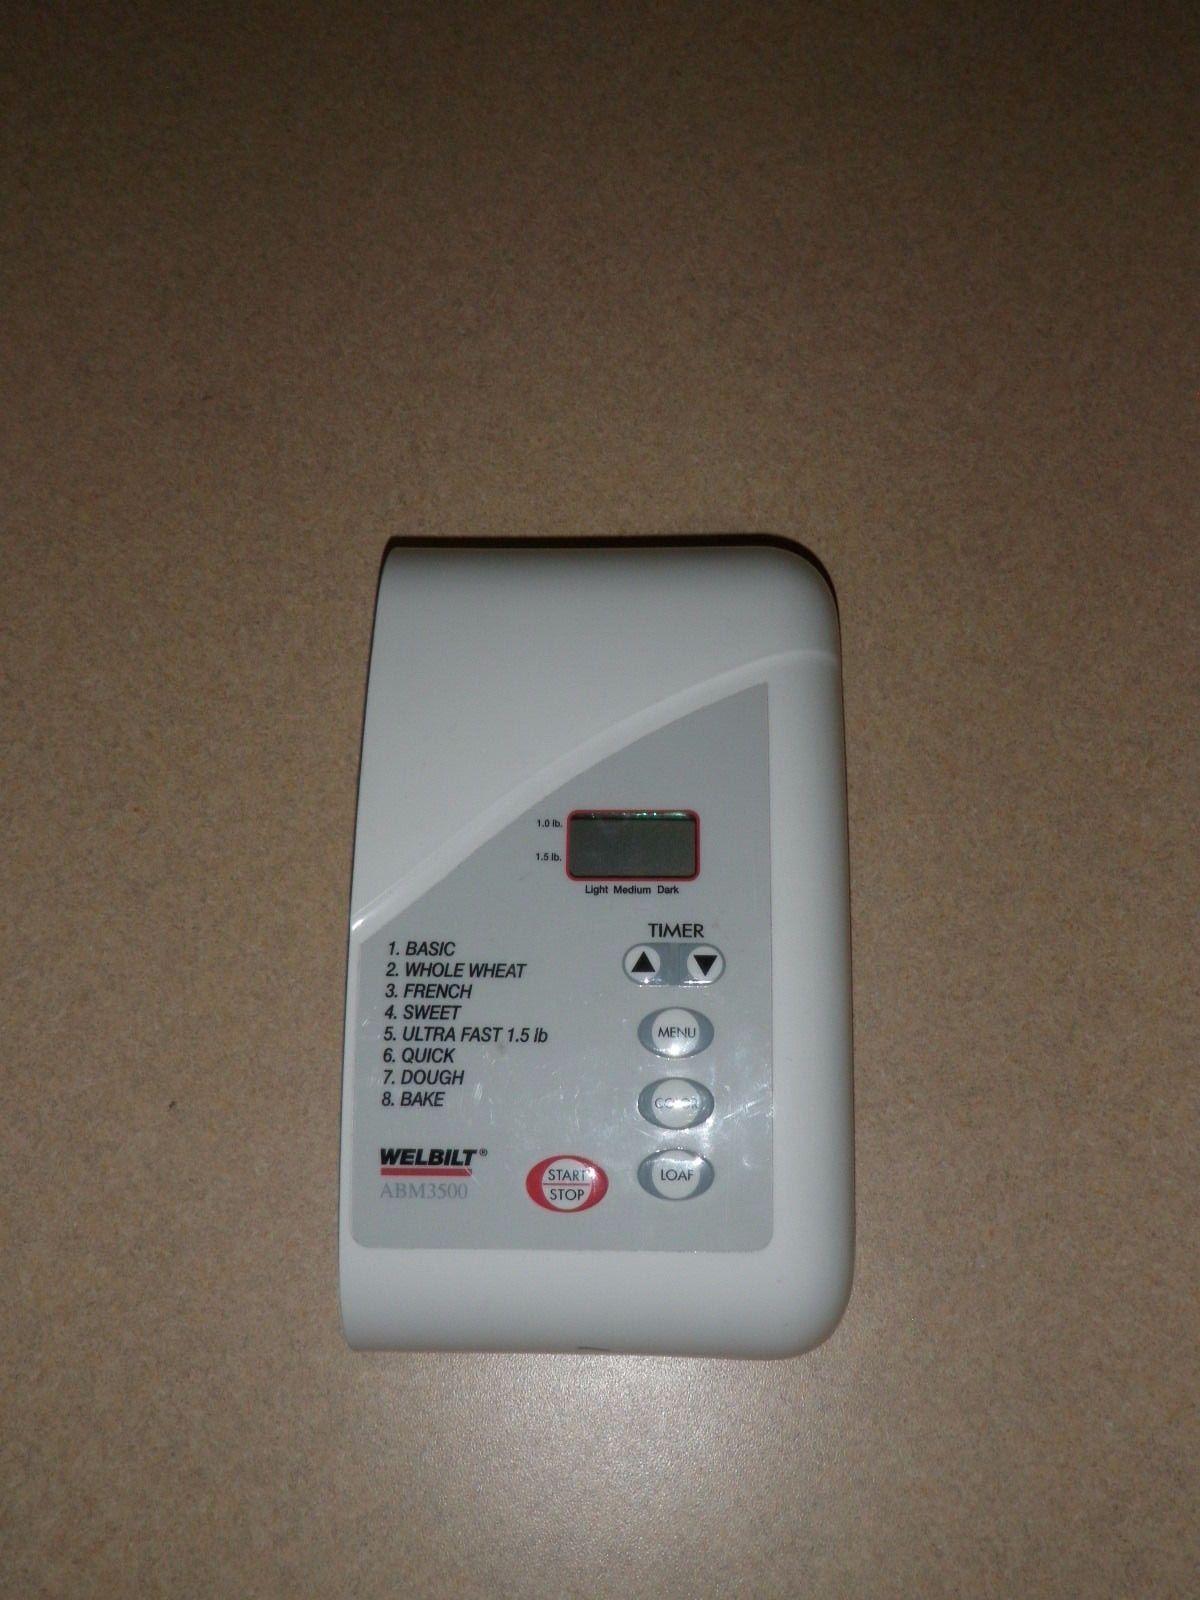 Welbilt Bread Machine Control Panel Model ABM3500 - $28.04